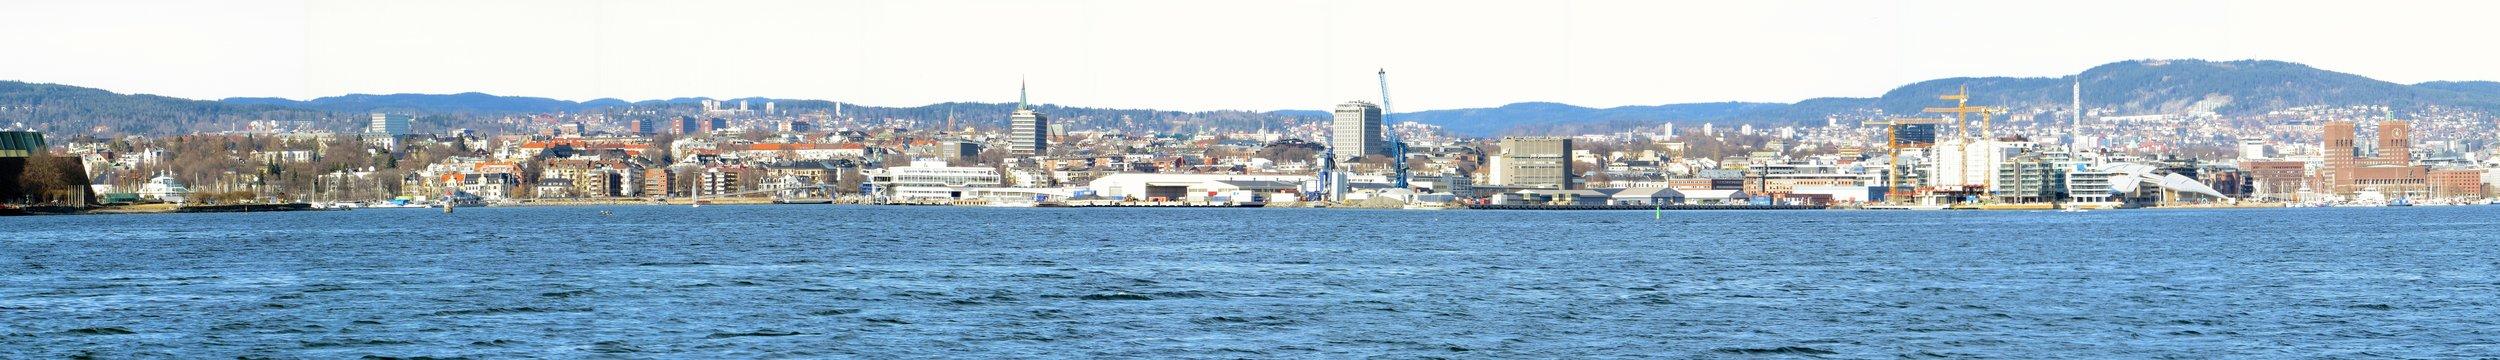 Oslo harbor panorama